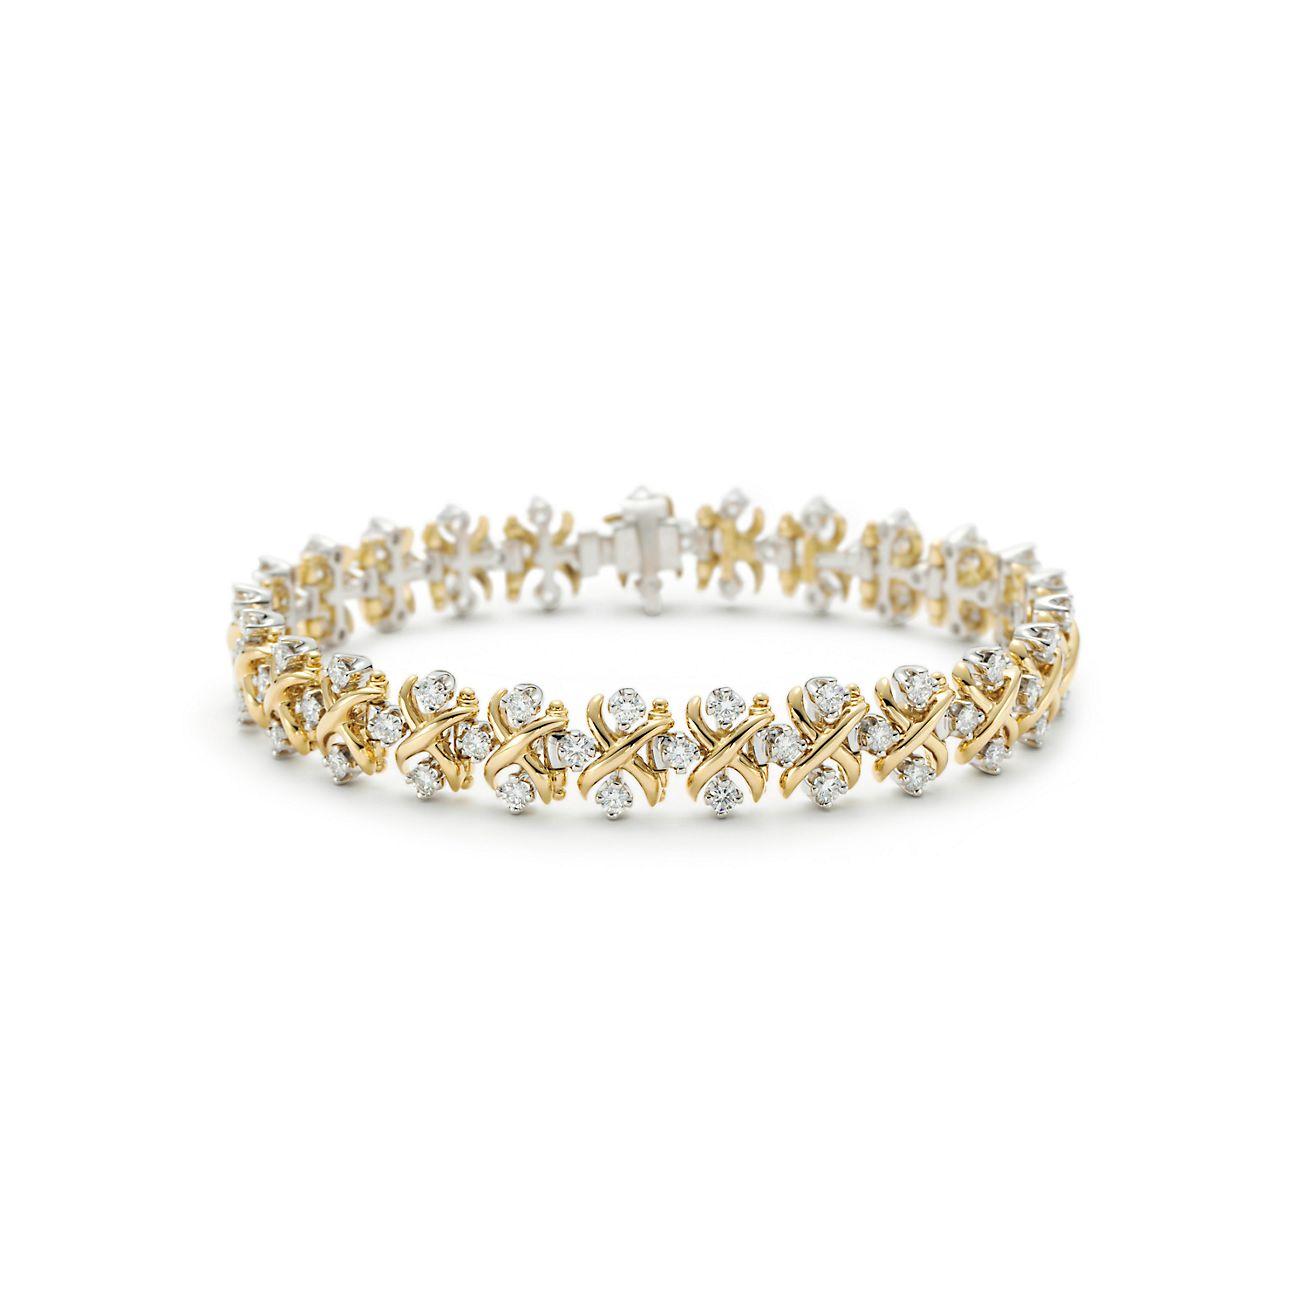 Tiffany Co Schlumberger Lynn Bracelet In Gold With Diamonds Tiffany Co